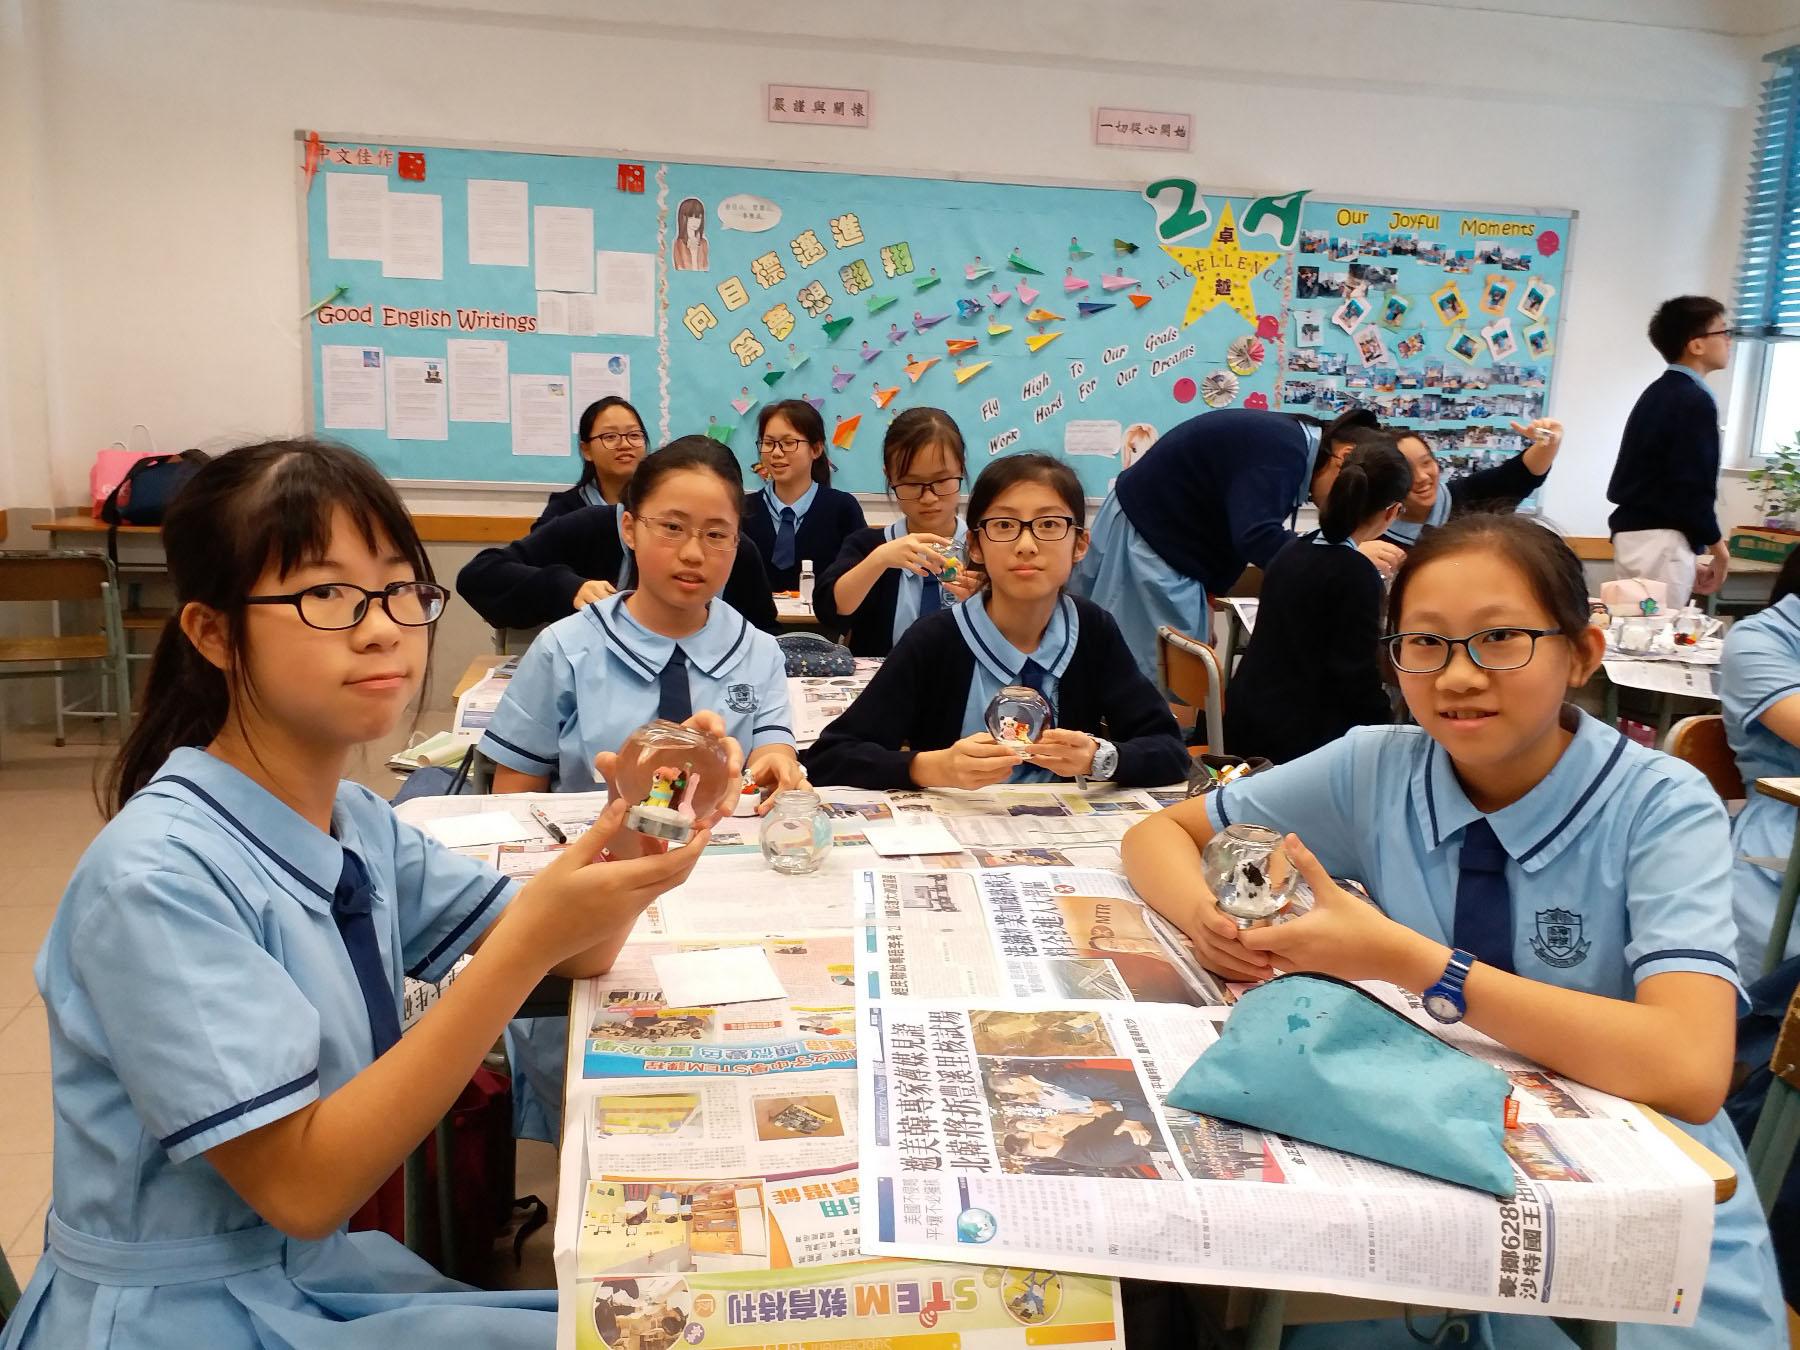 http://www.npc.edu.hk/sites/default/files/20180511_170219.jpg